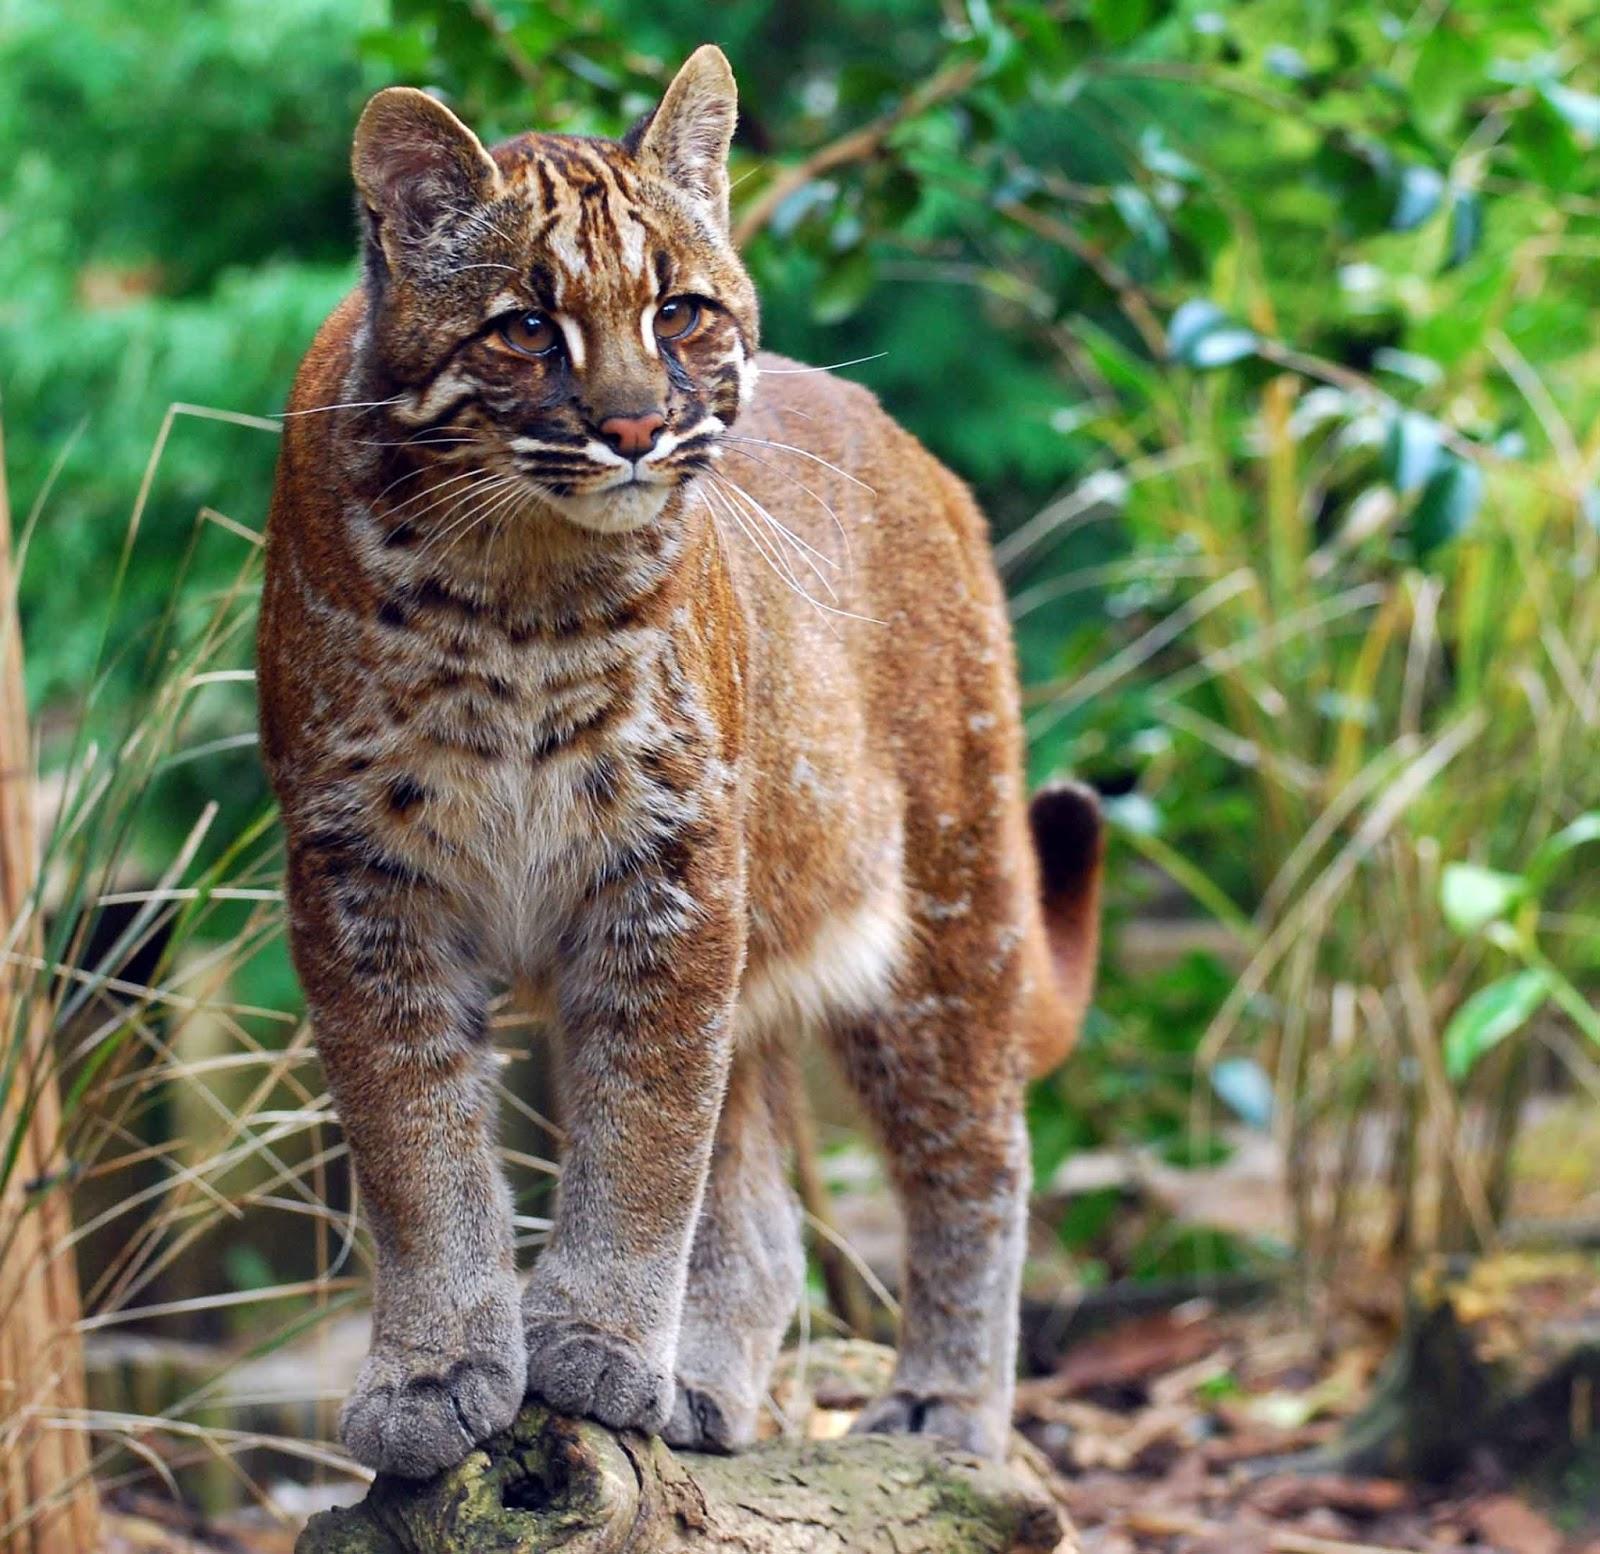 Kucing Merah Khas Kalimantan | Berita Seputar Kucing